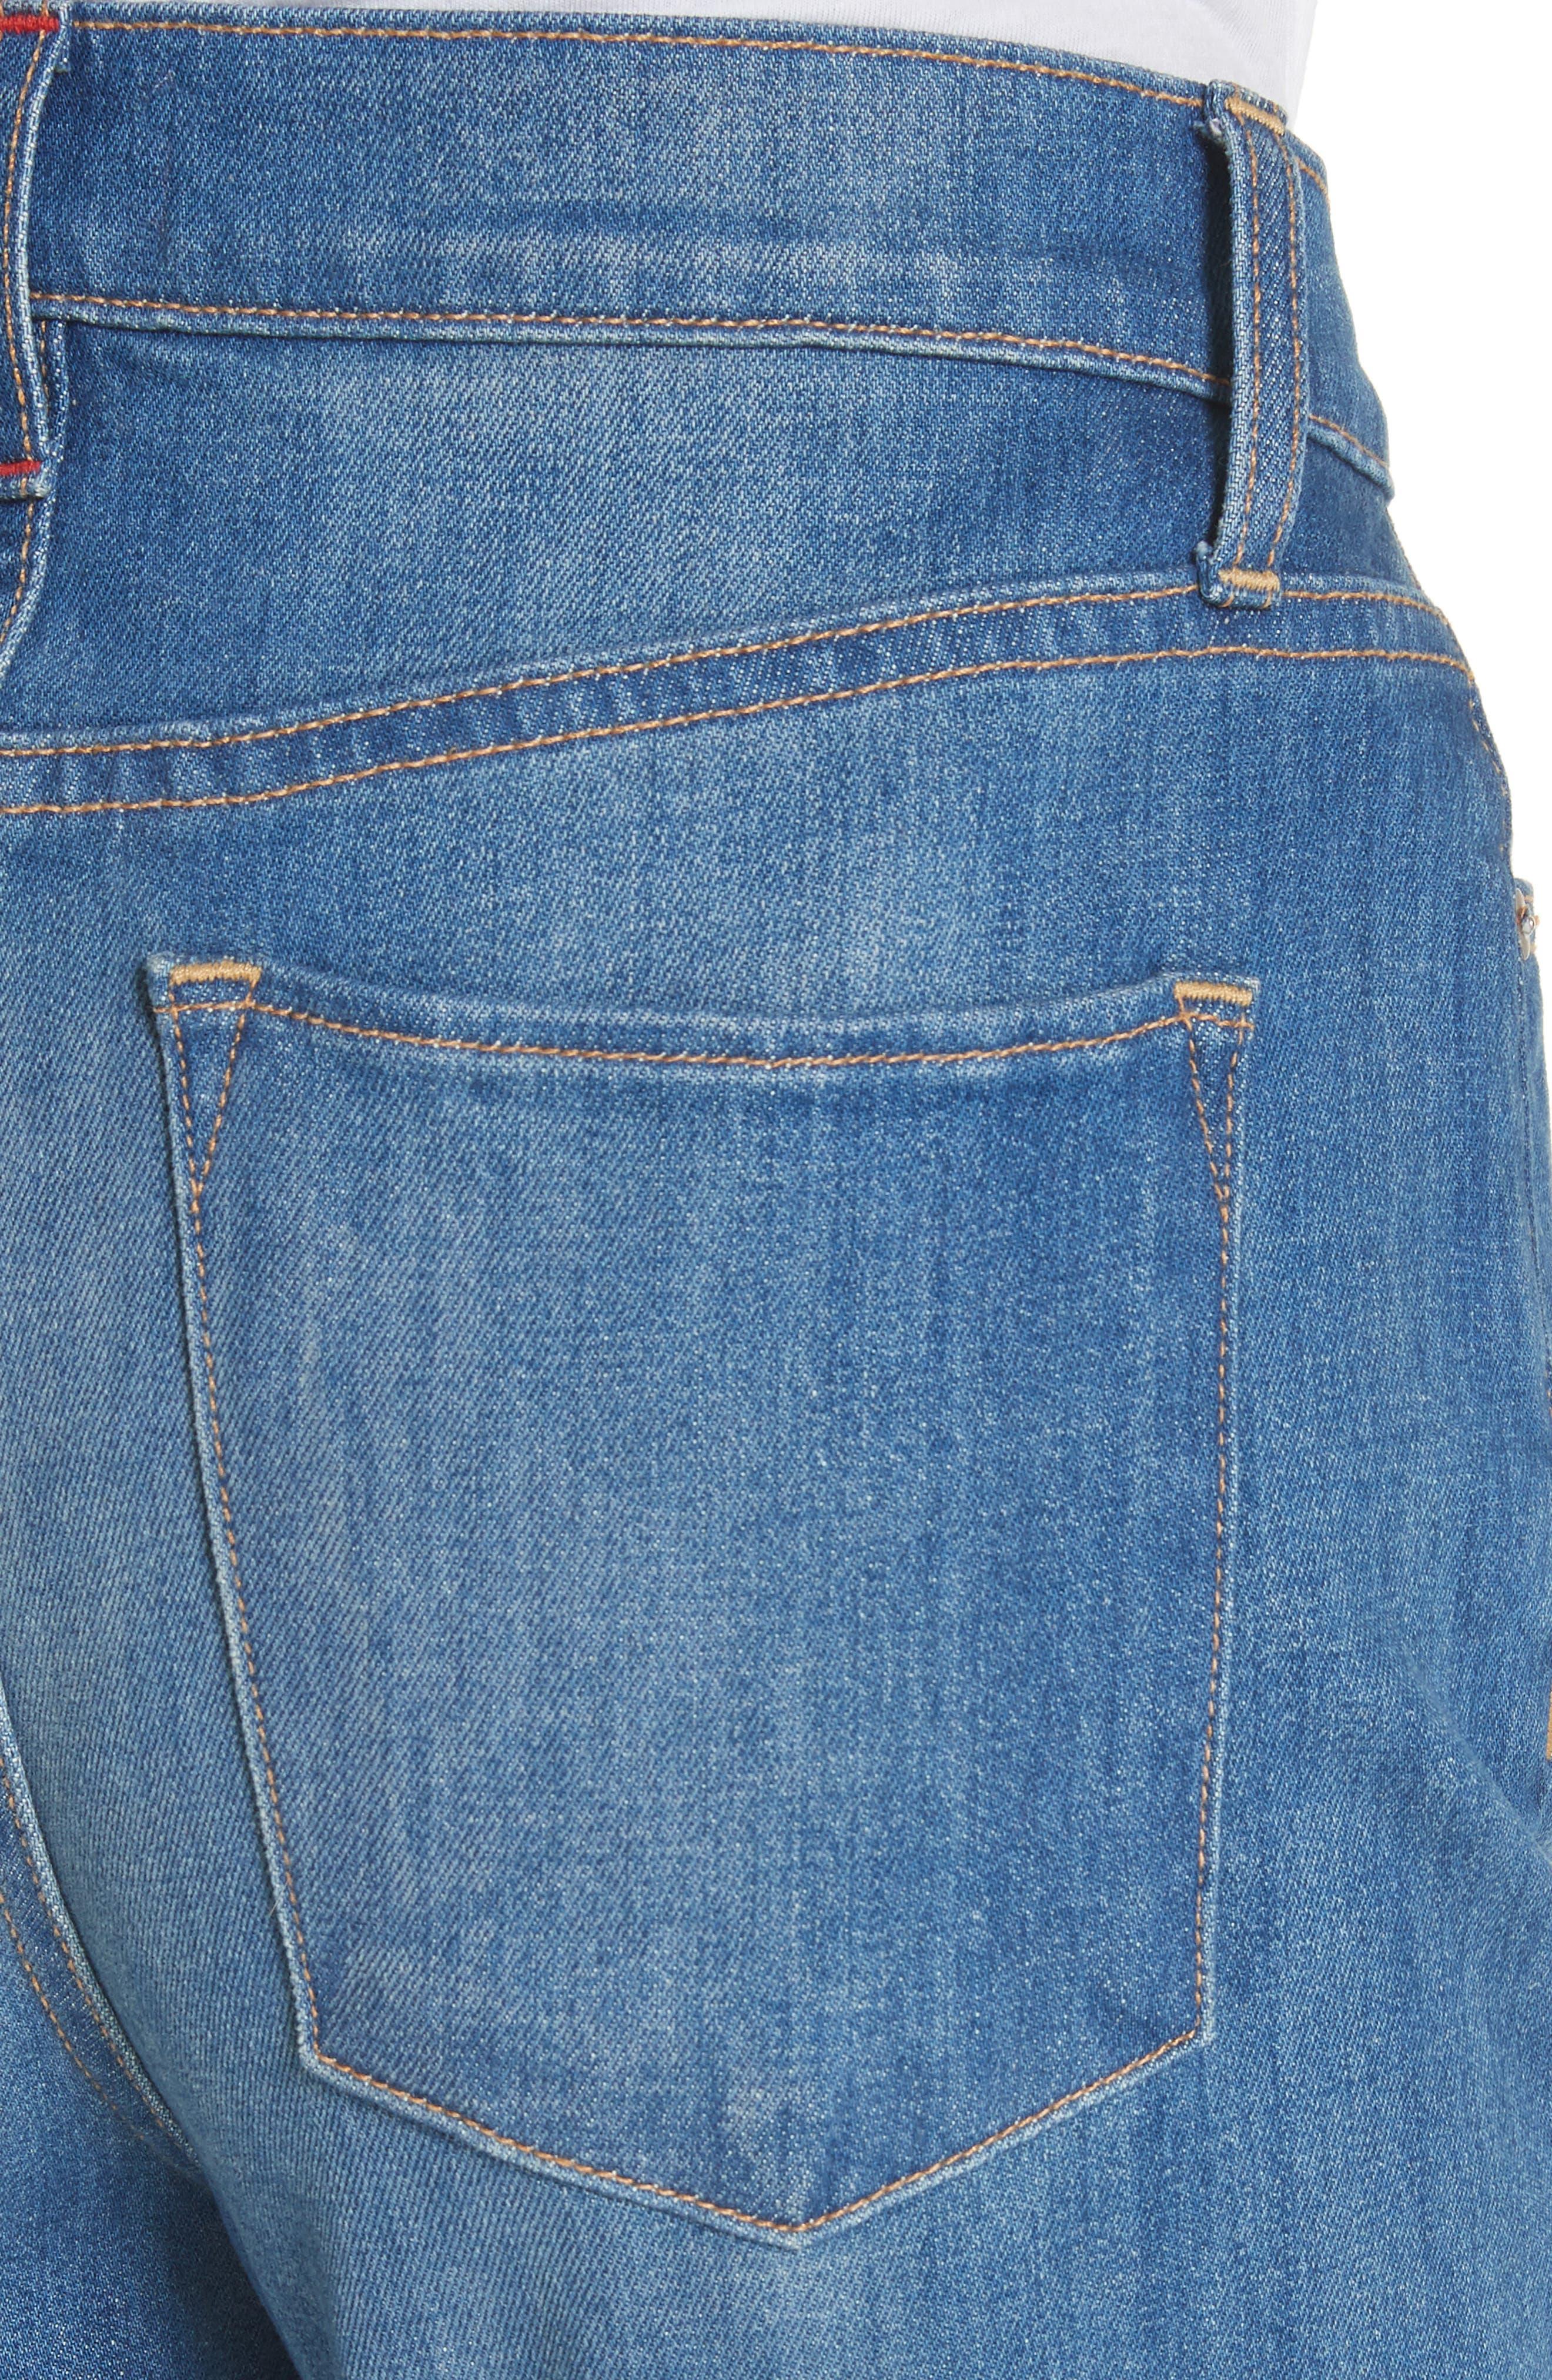 AO.LA Good High Waist Ankle Skinny Jeans,                             Alternate thumbnail 4, color,